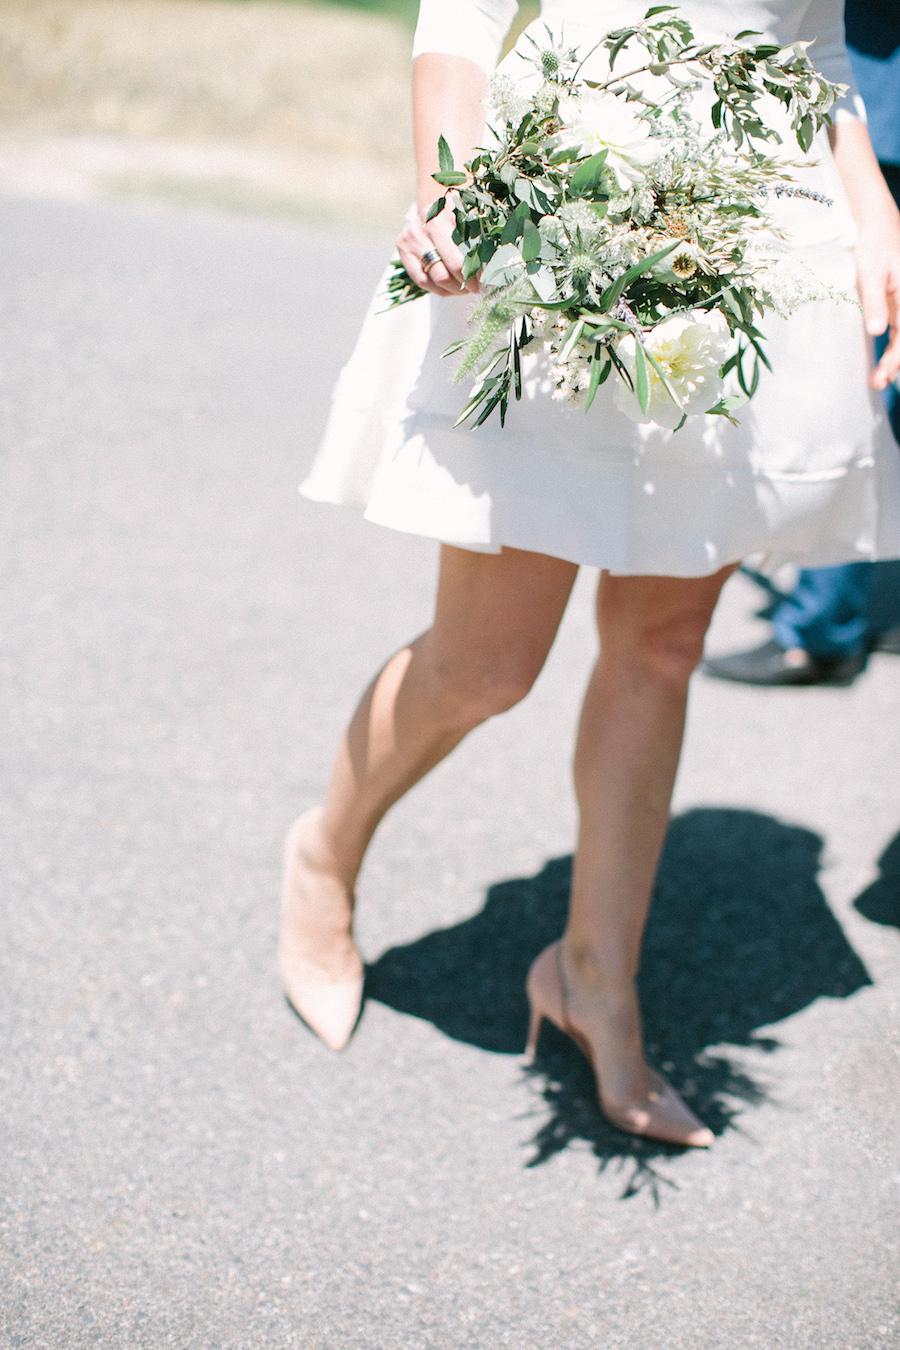 saya-photography-rustic-french-wedding-provence-domaines-de-patras-37.jpg